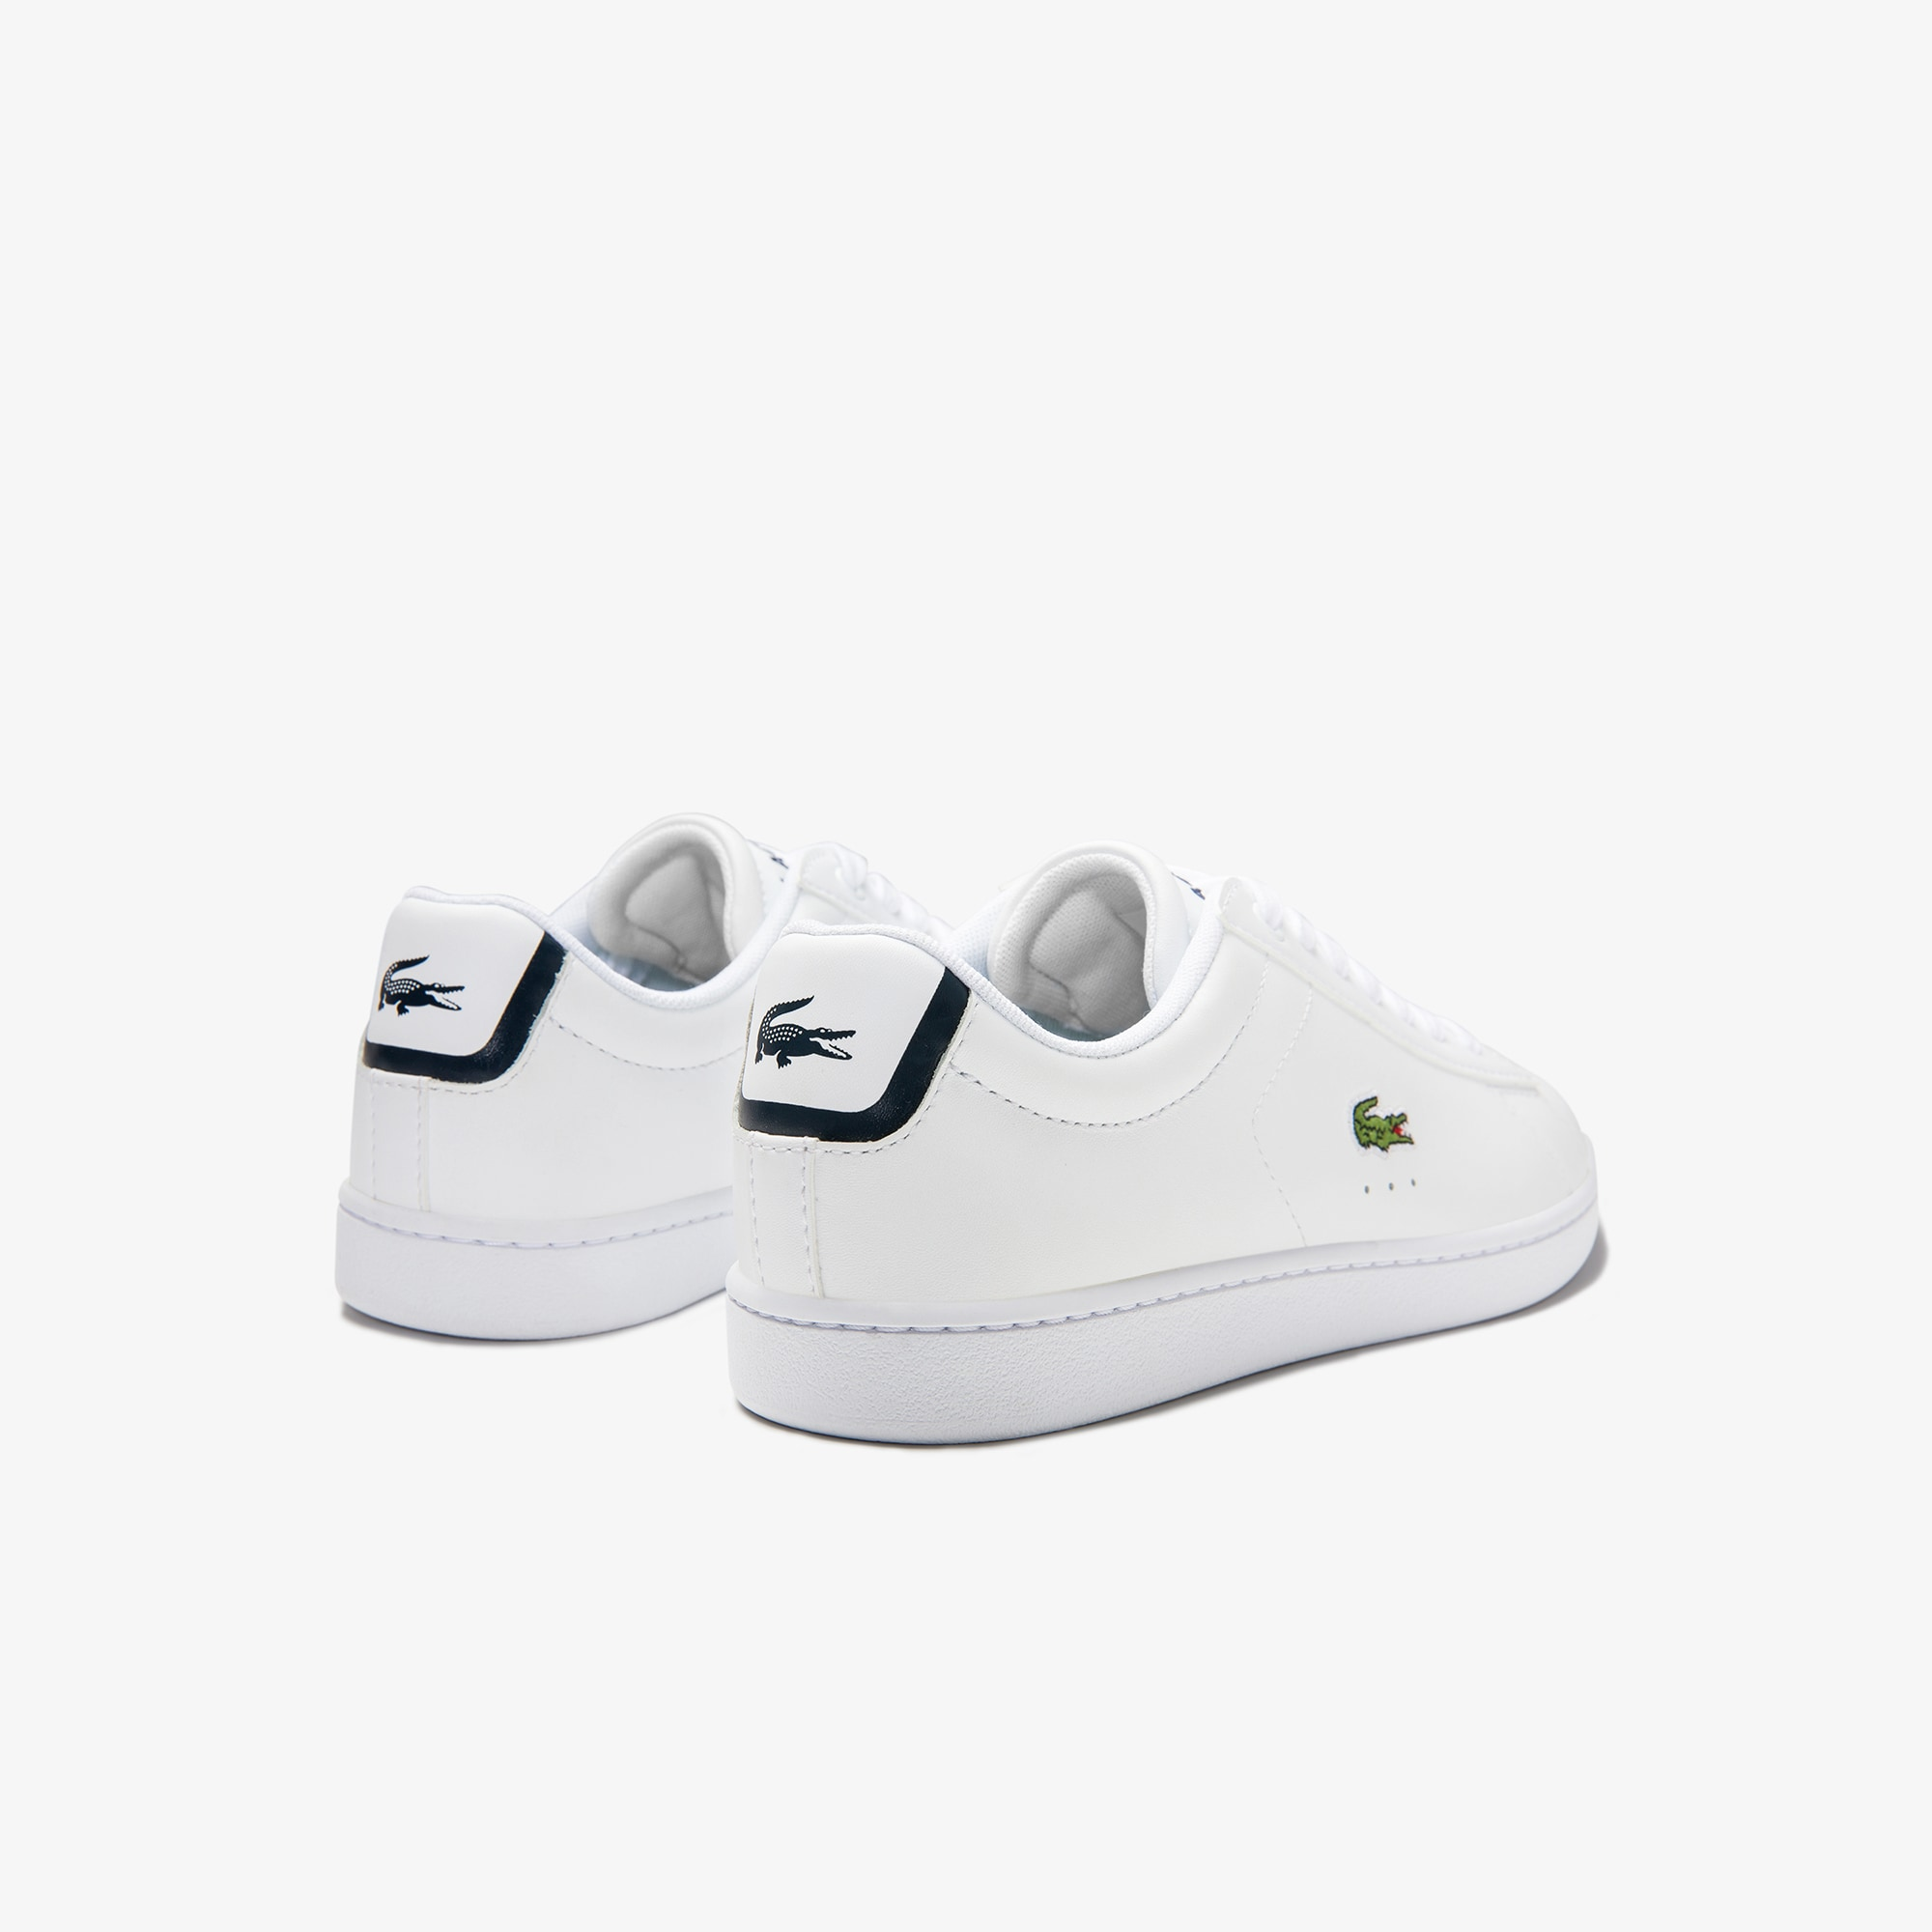 Evo Sneakers Lacoste Cuir Femme En Carnaby 7q4wf